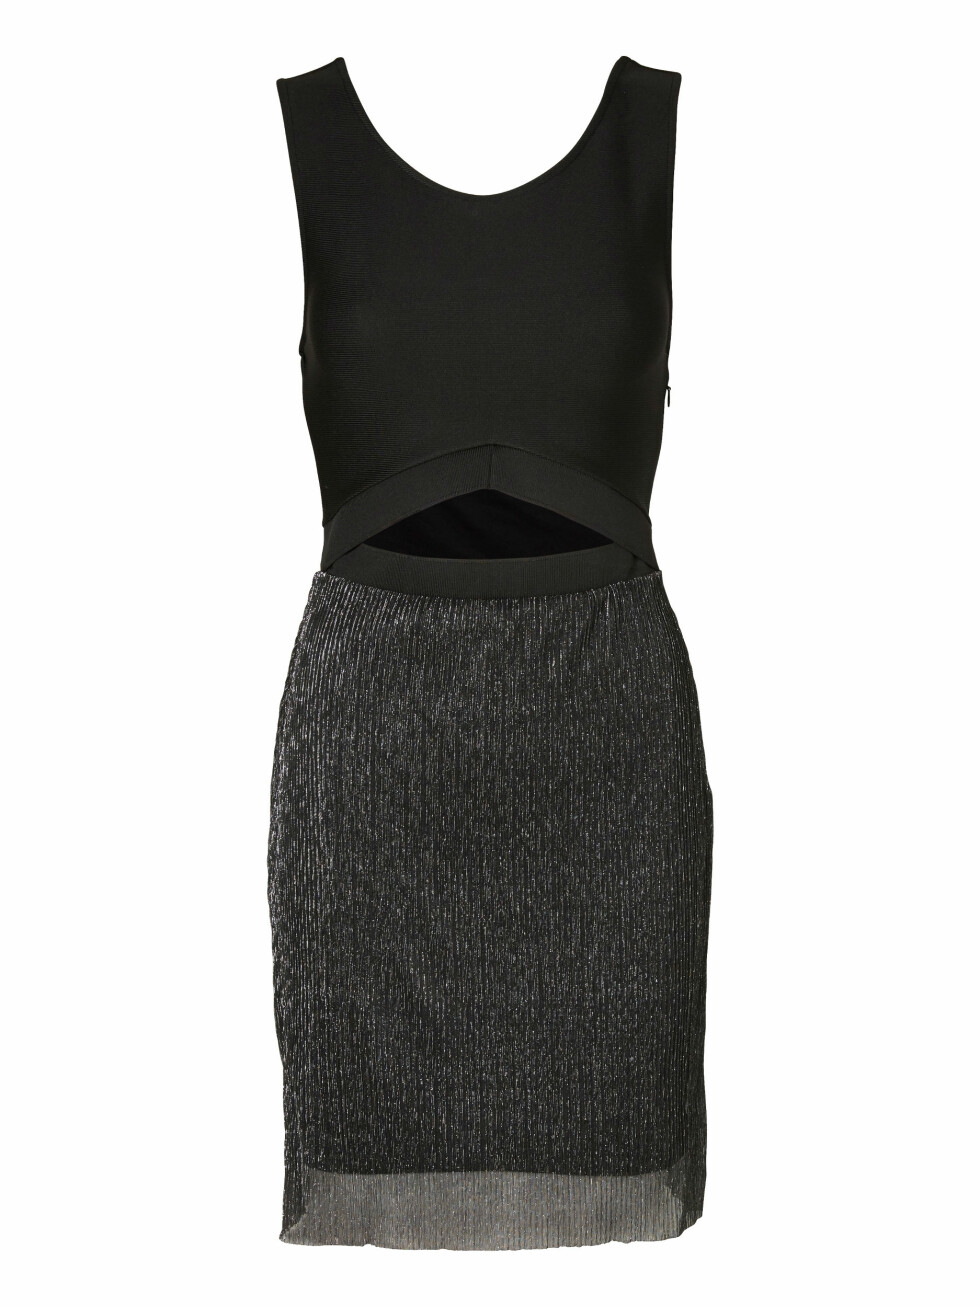 Kjole fra Lily Allen x Vero Moda, kr 399. Foto: Vero Moda